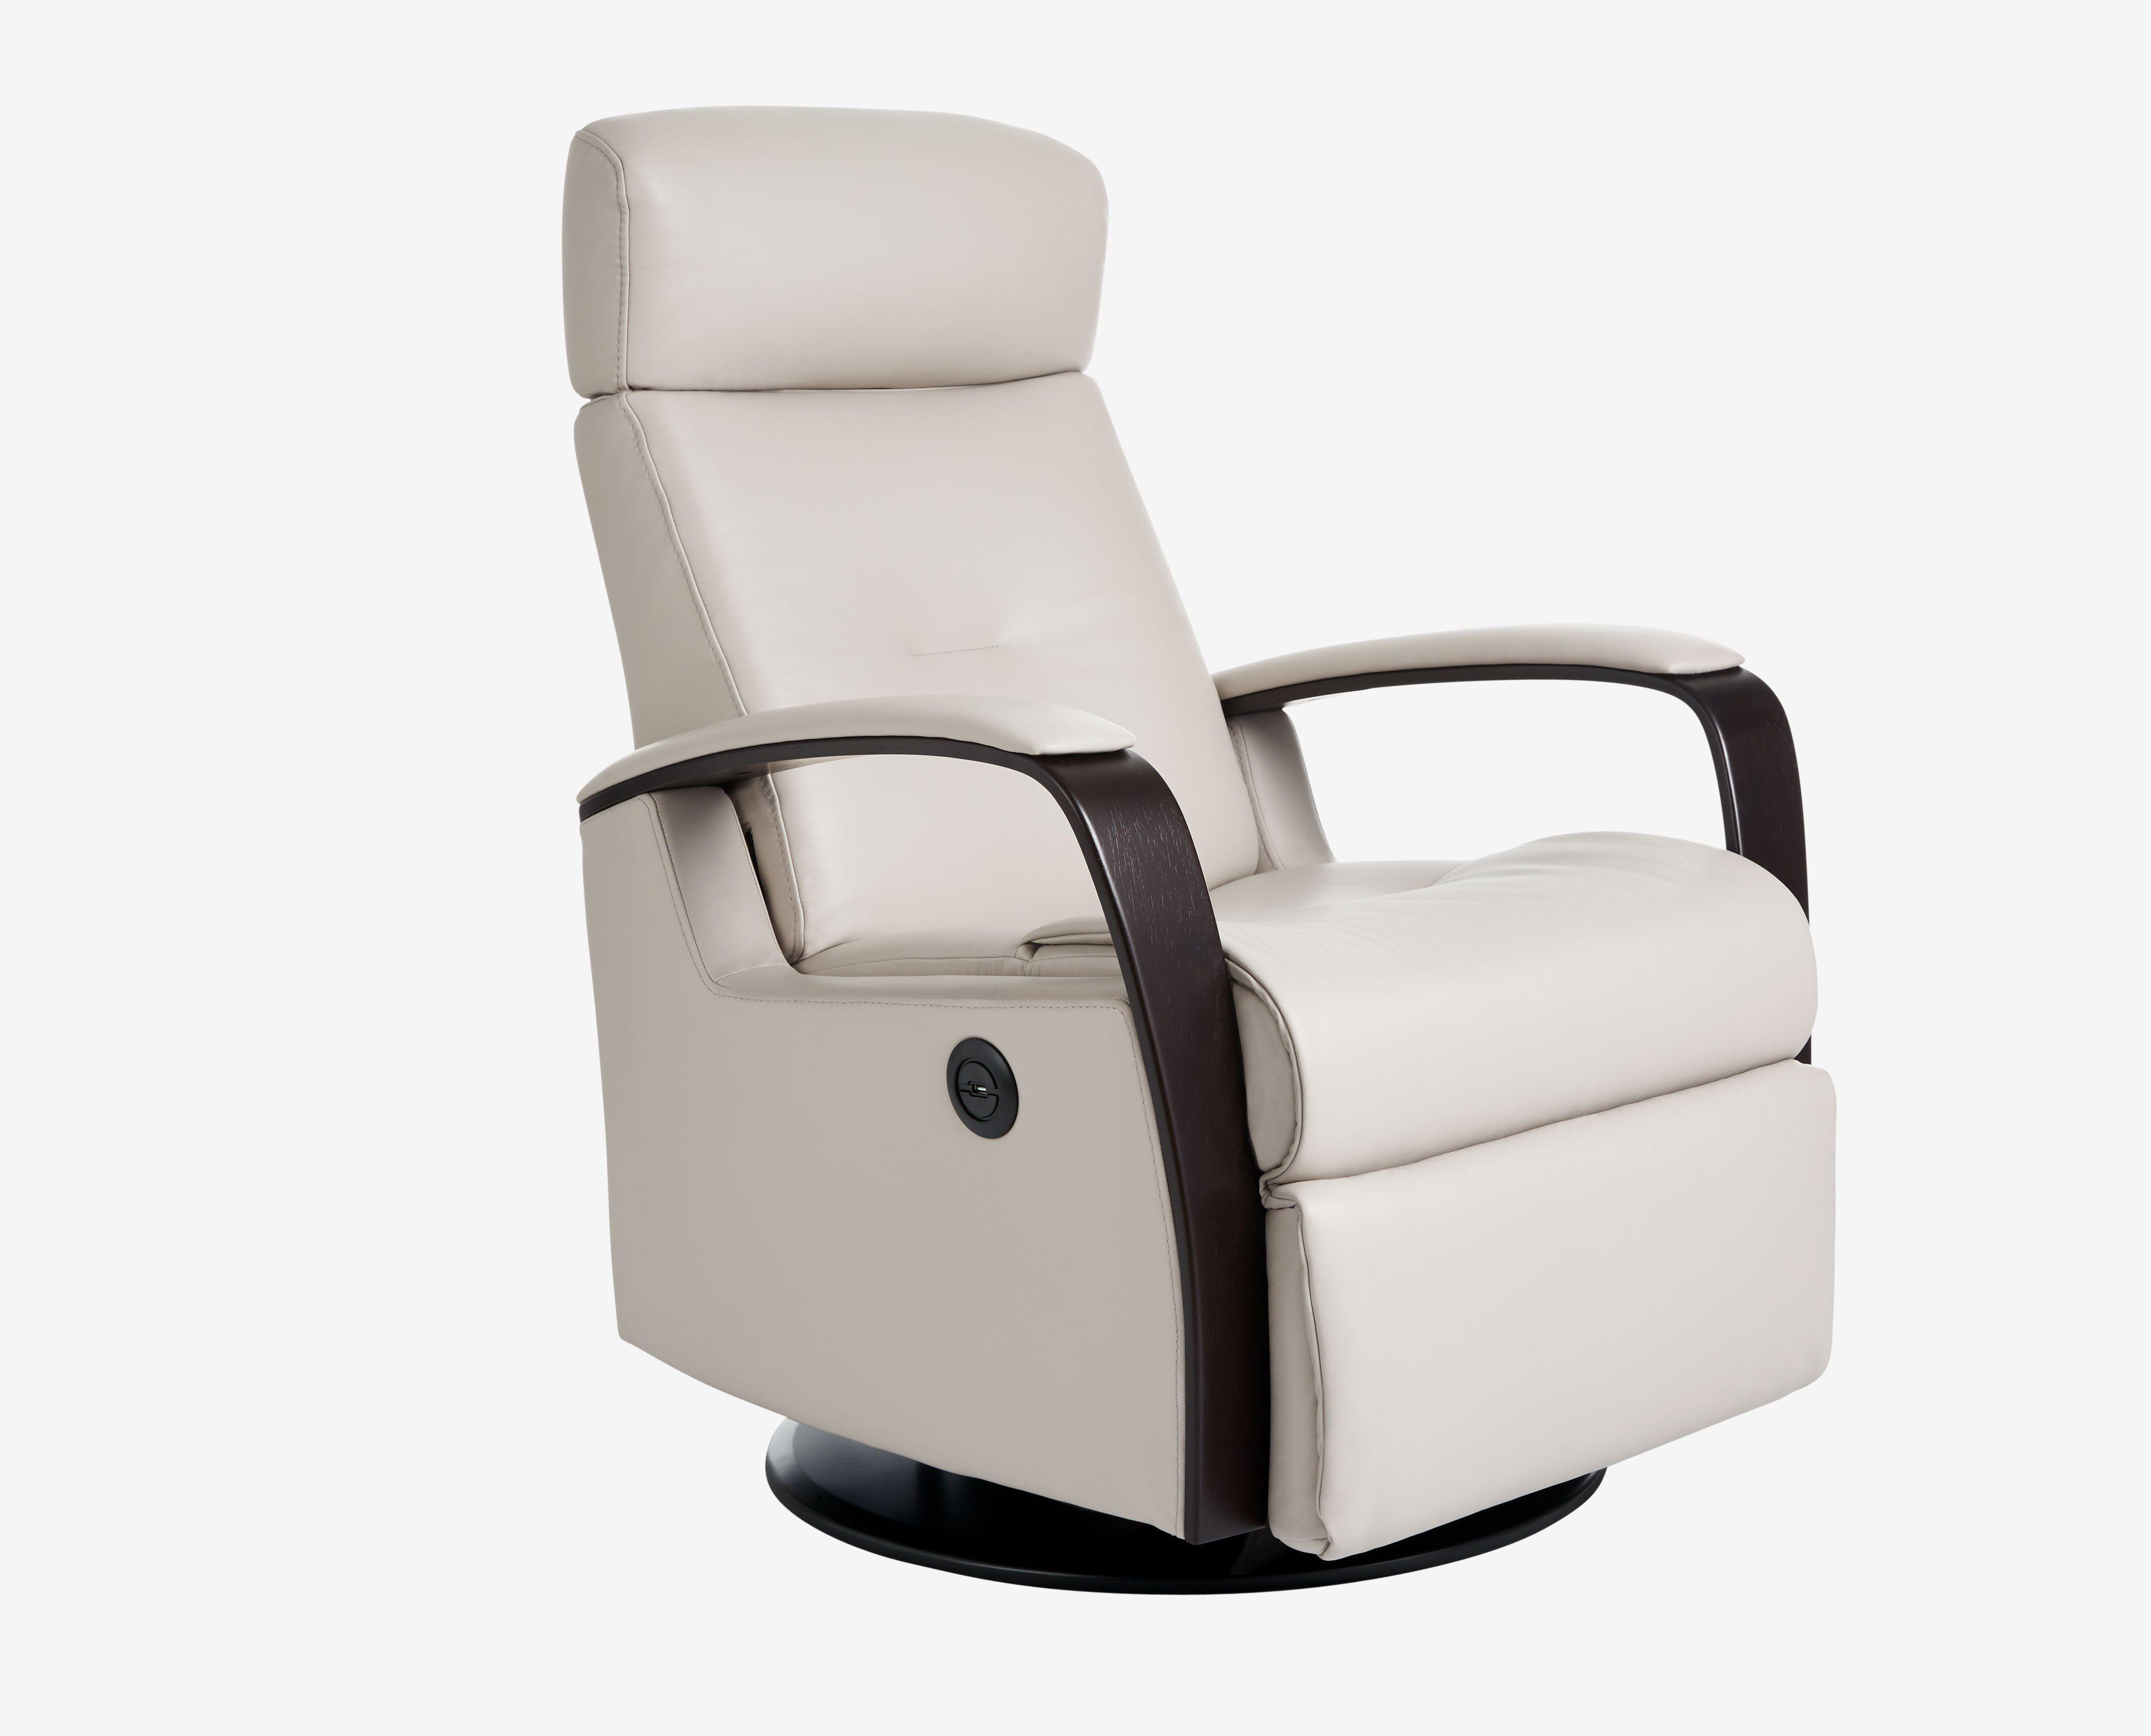 Namsos Power Motion Recliner Club Chair Recliner Recliner Chair Lift Chair Recliners